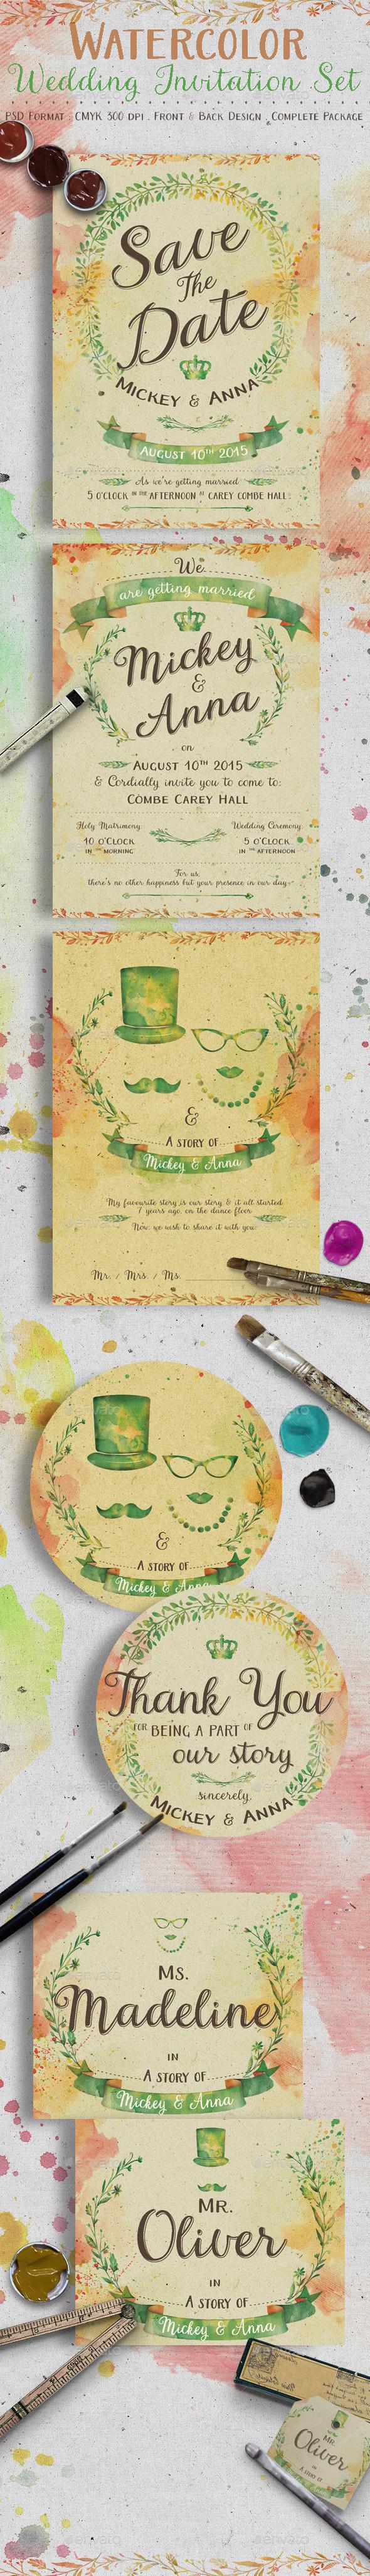 Watercolor Wedding Invitation Set - Weddings Cards & Invites